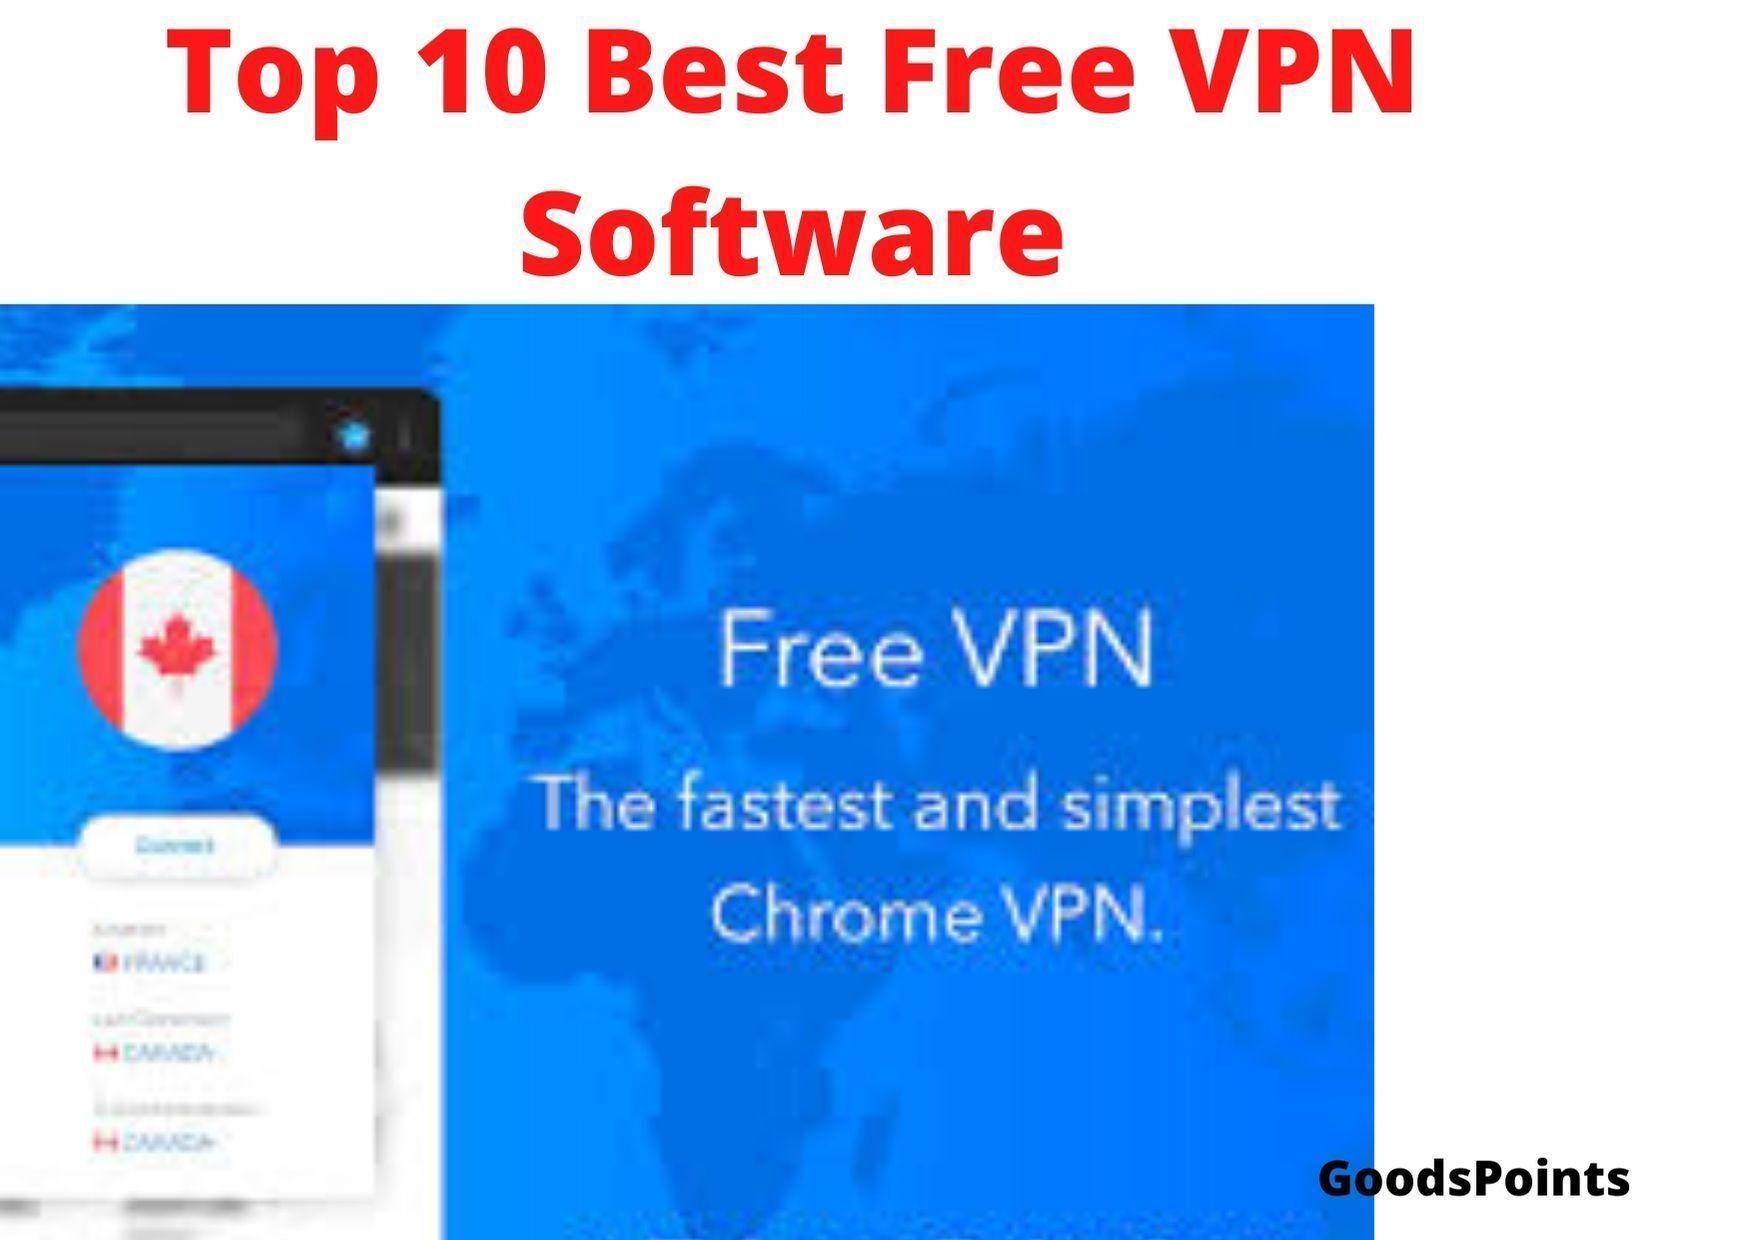 f73ad27d6a282b44e6012317dad897a9 - Top 10 Free Vpn For Chrome